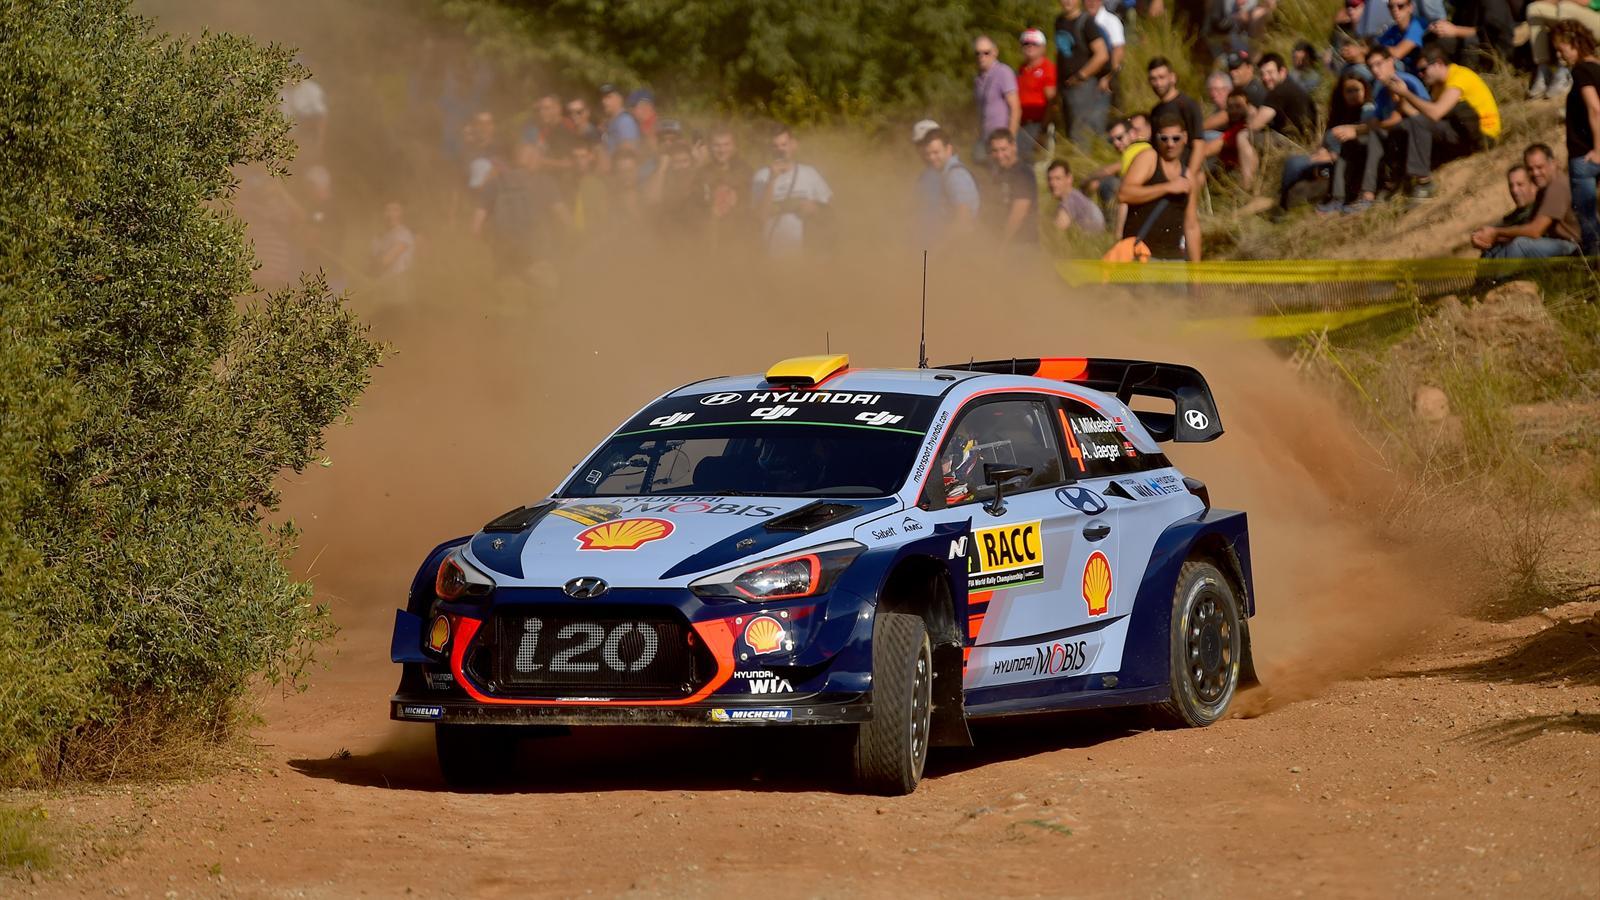 Rallye espagne 2018